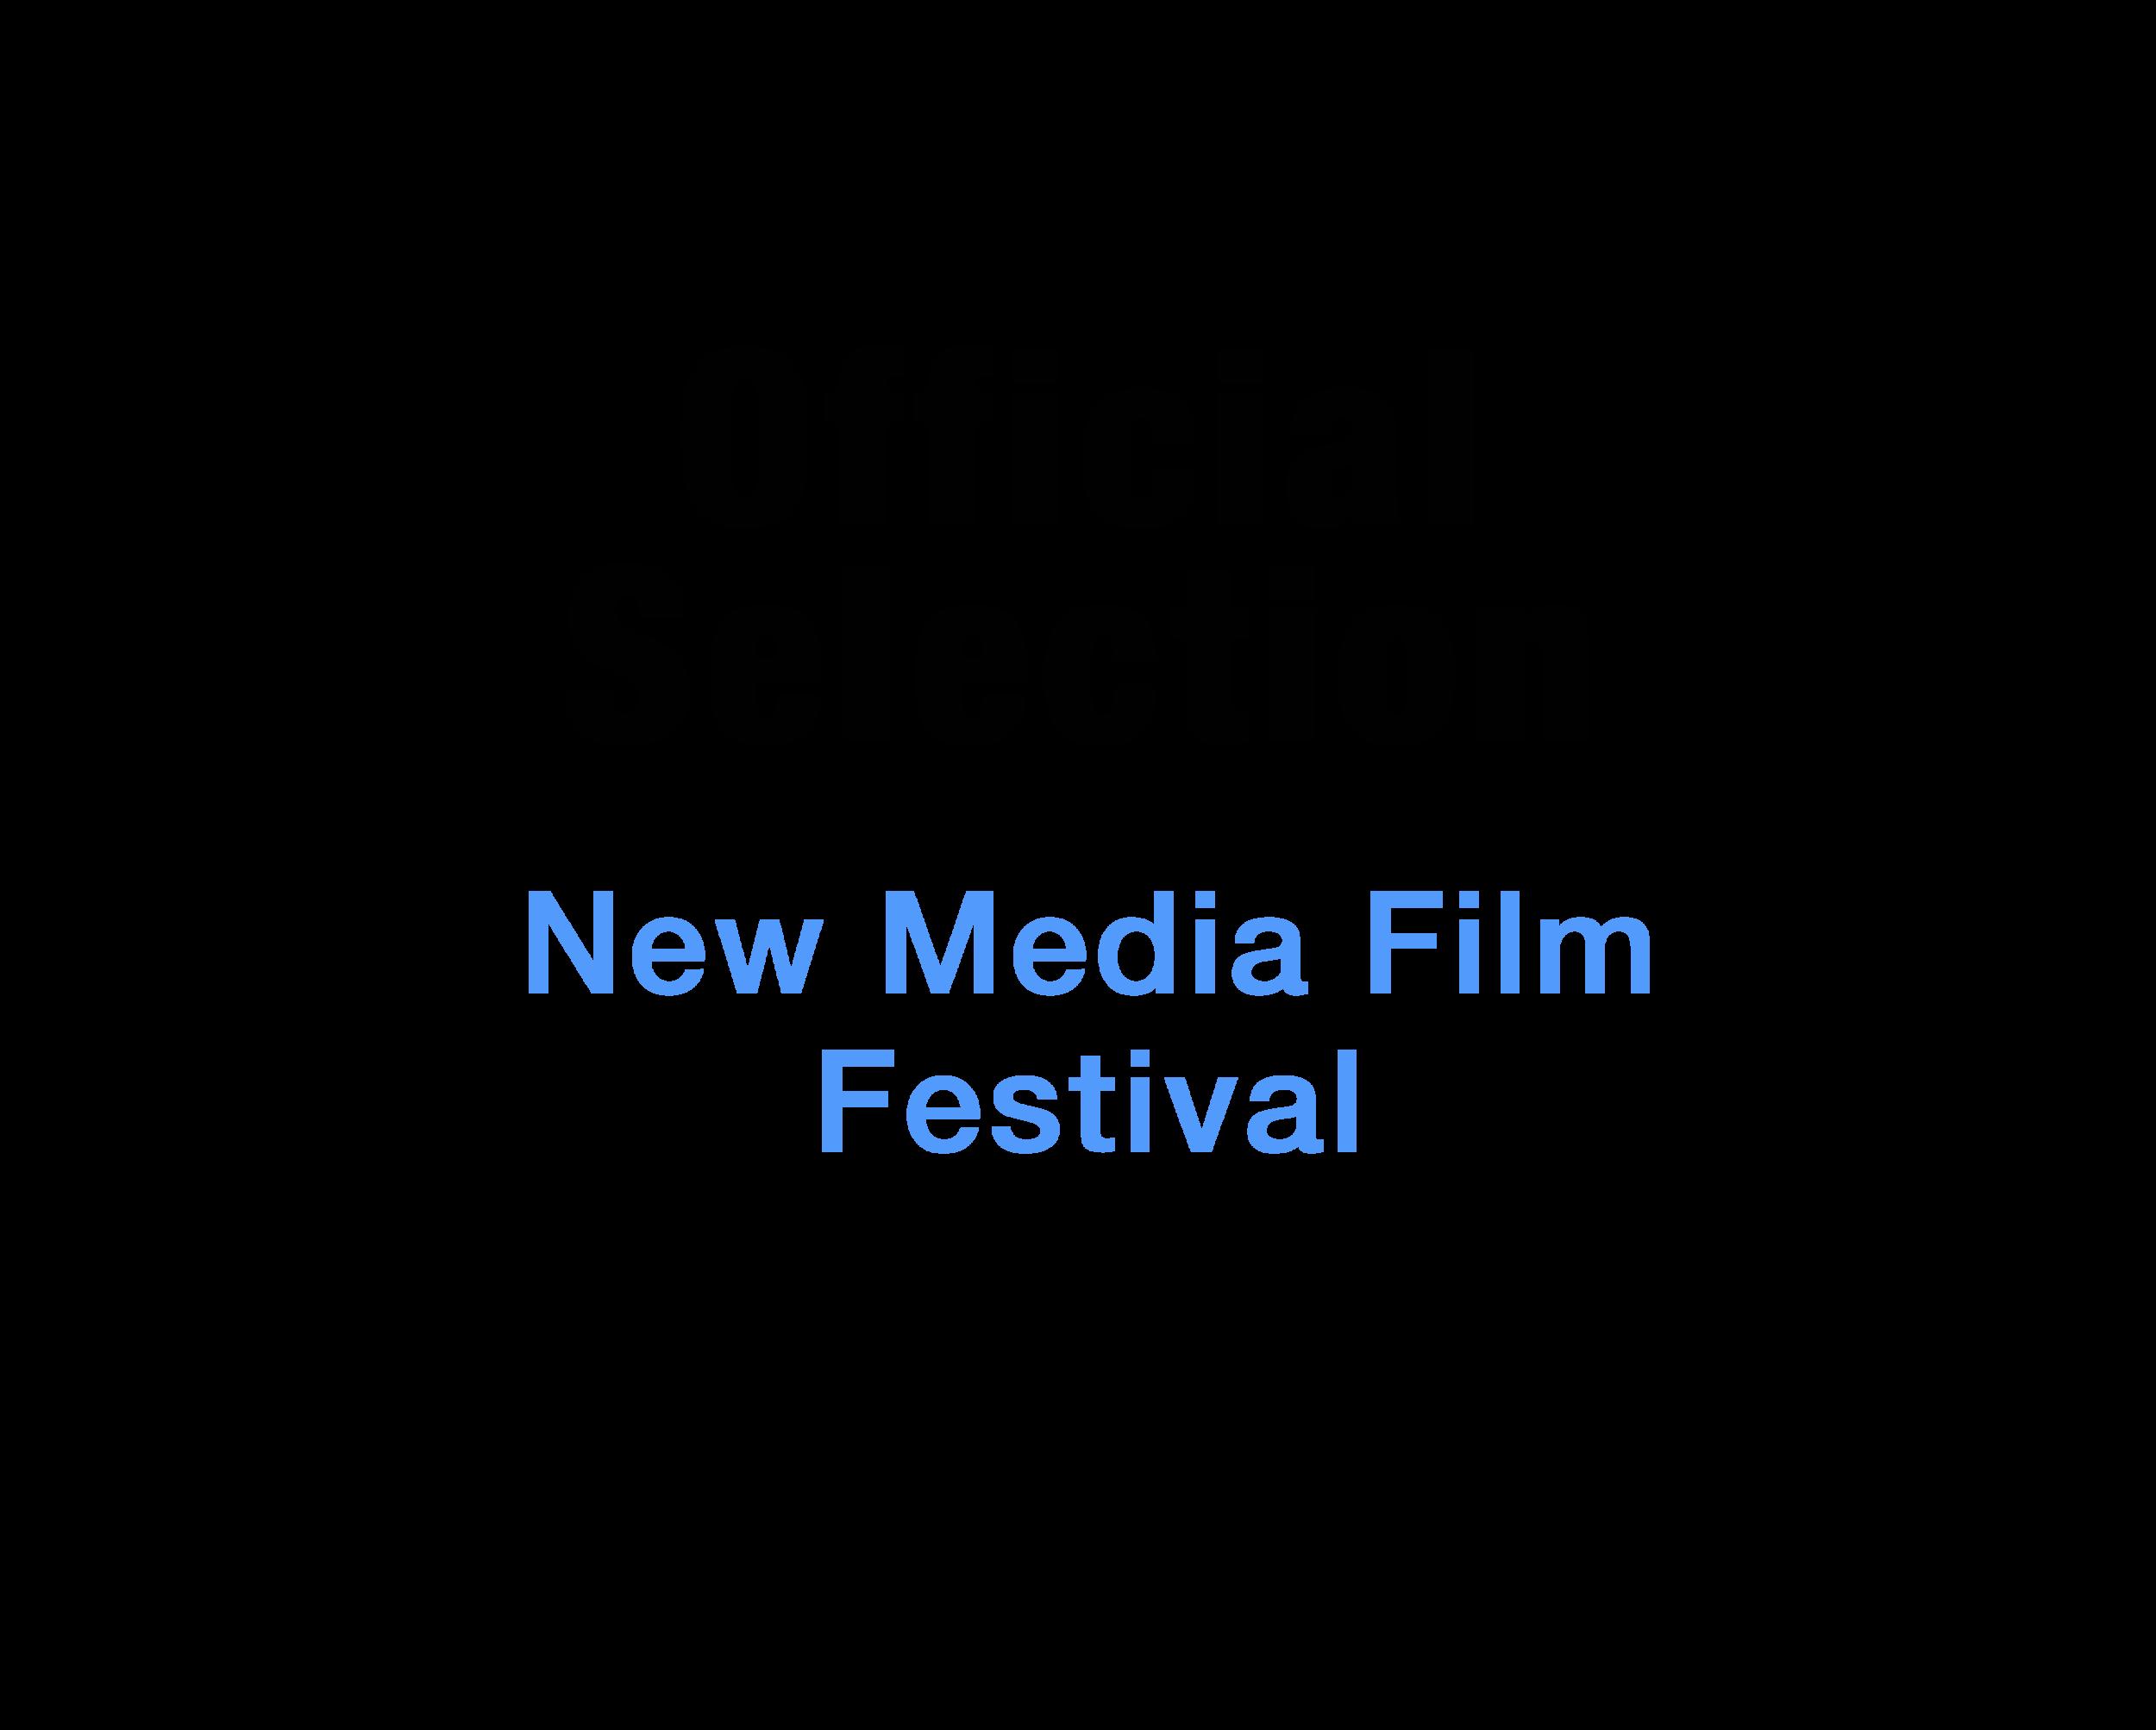 2018 NMFF laurel transparent official selection PNG.png